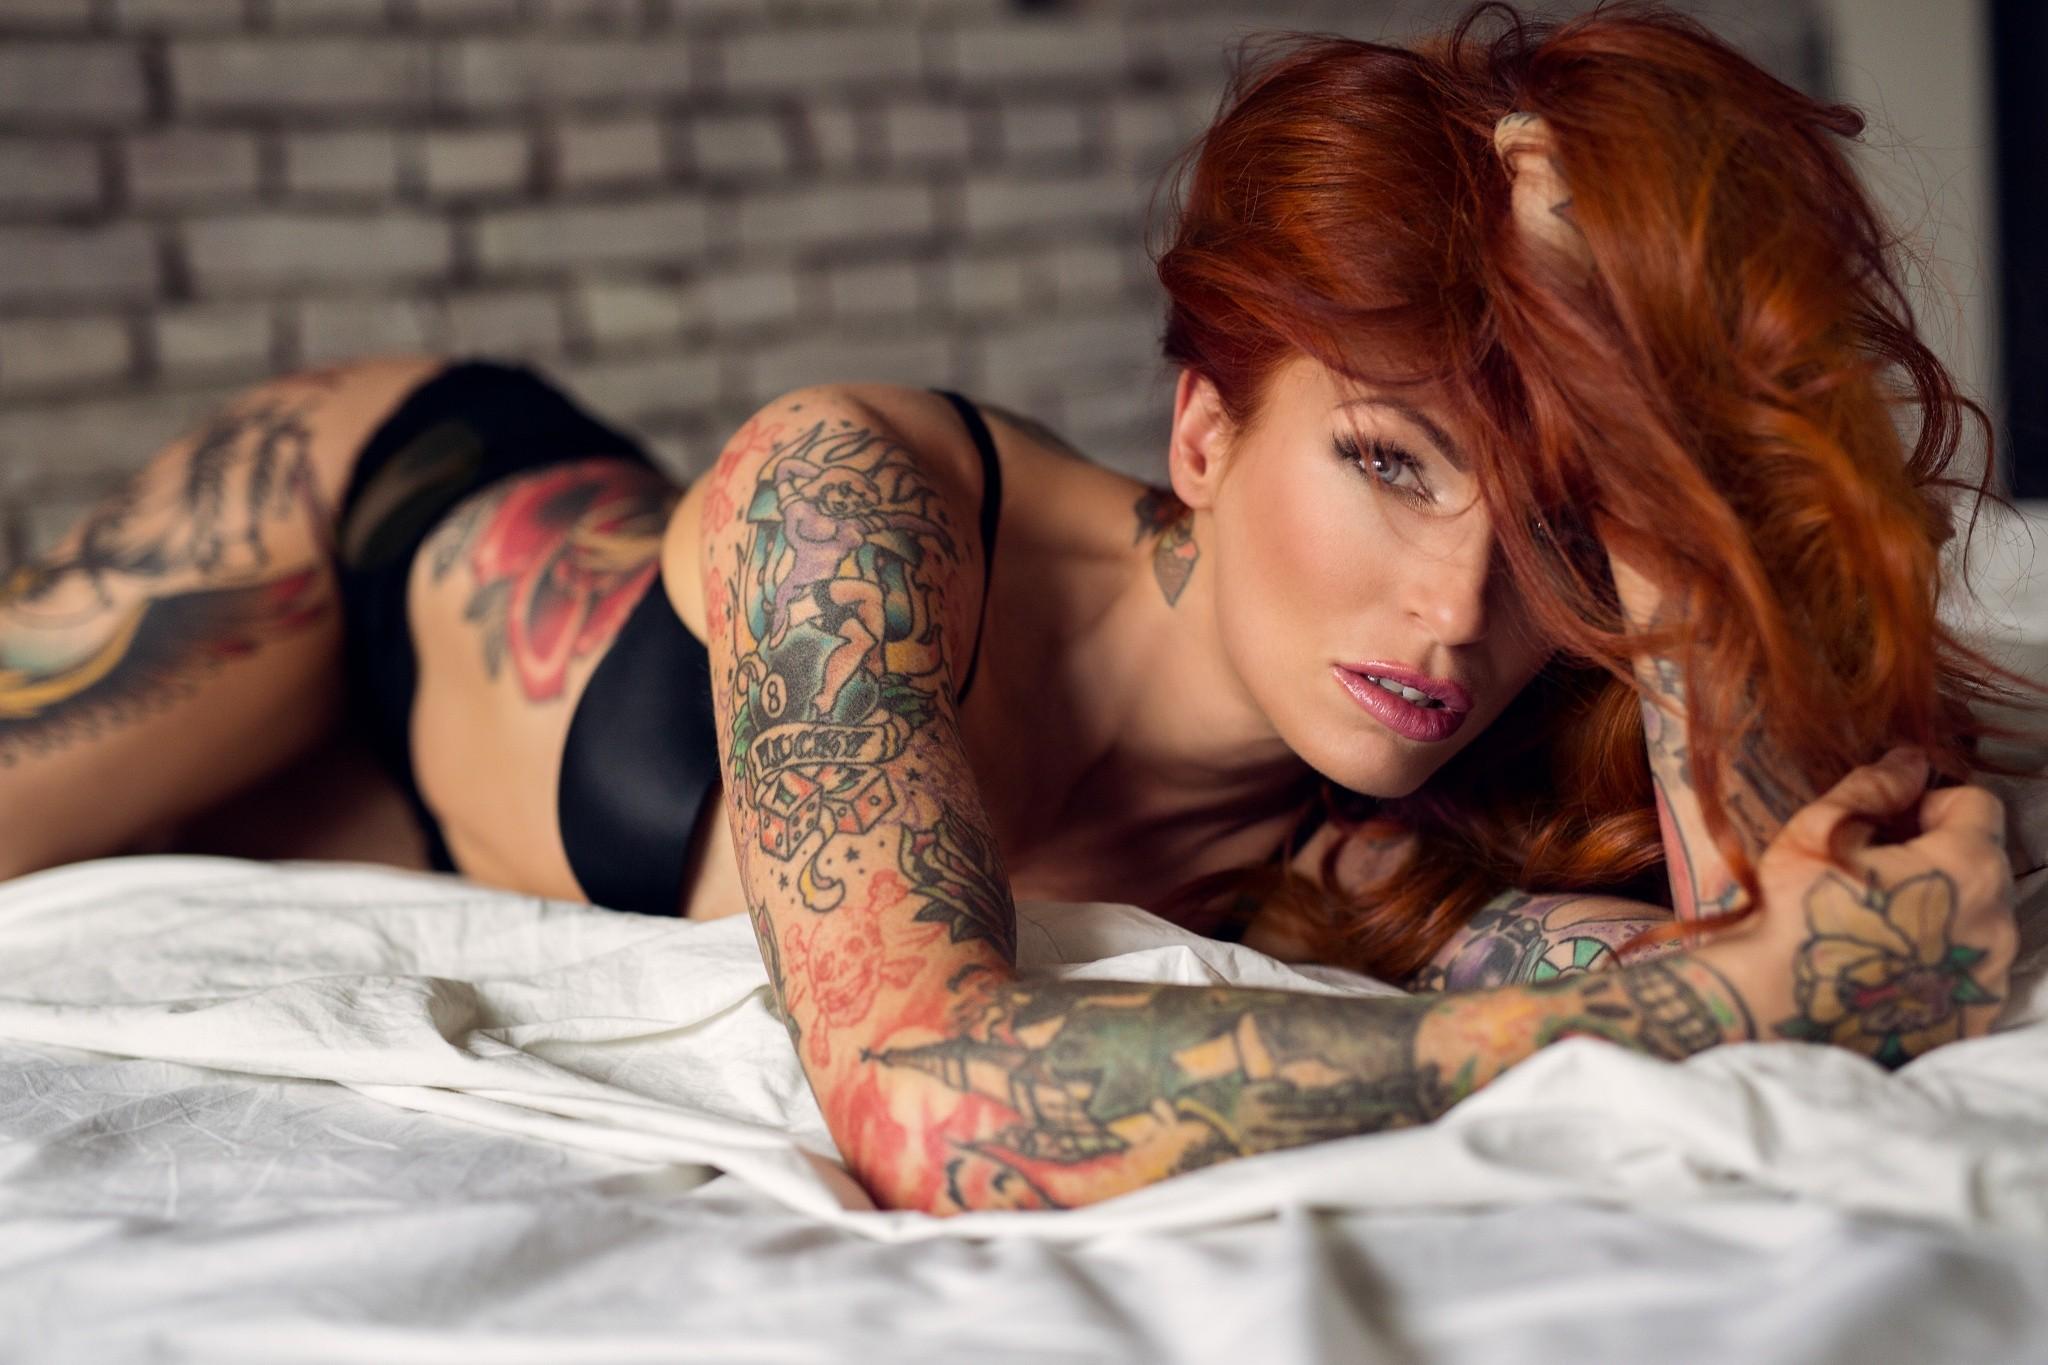 Tattoo Girl Anal Tattoo Girl Anal Sex Porn Tattoo Girl Anal Sex Porn